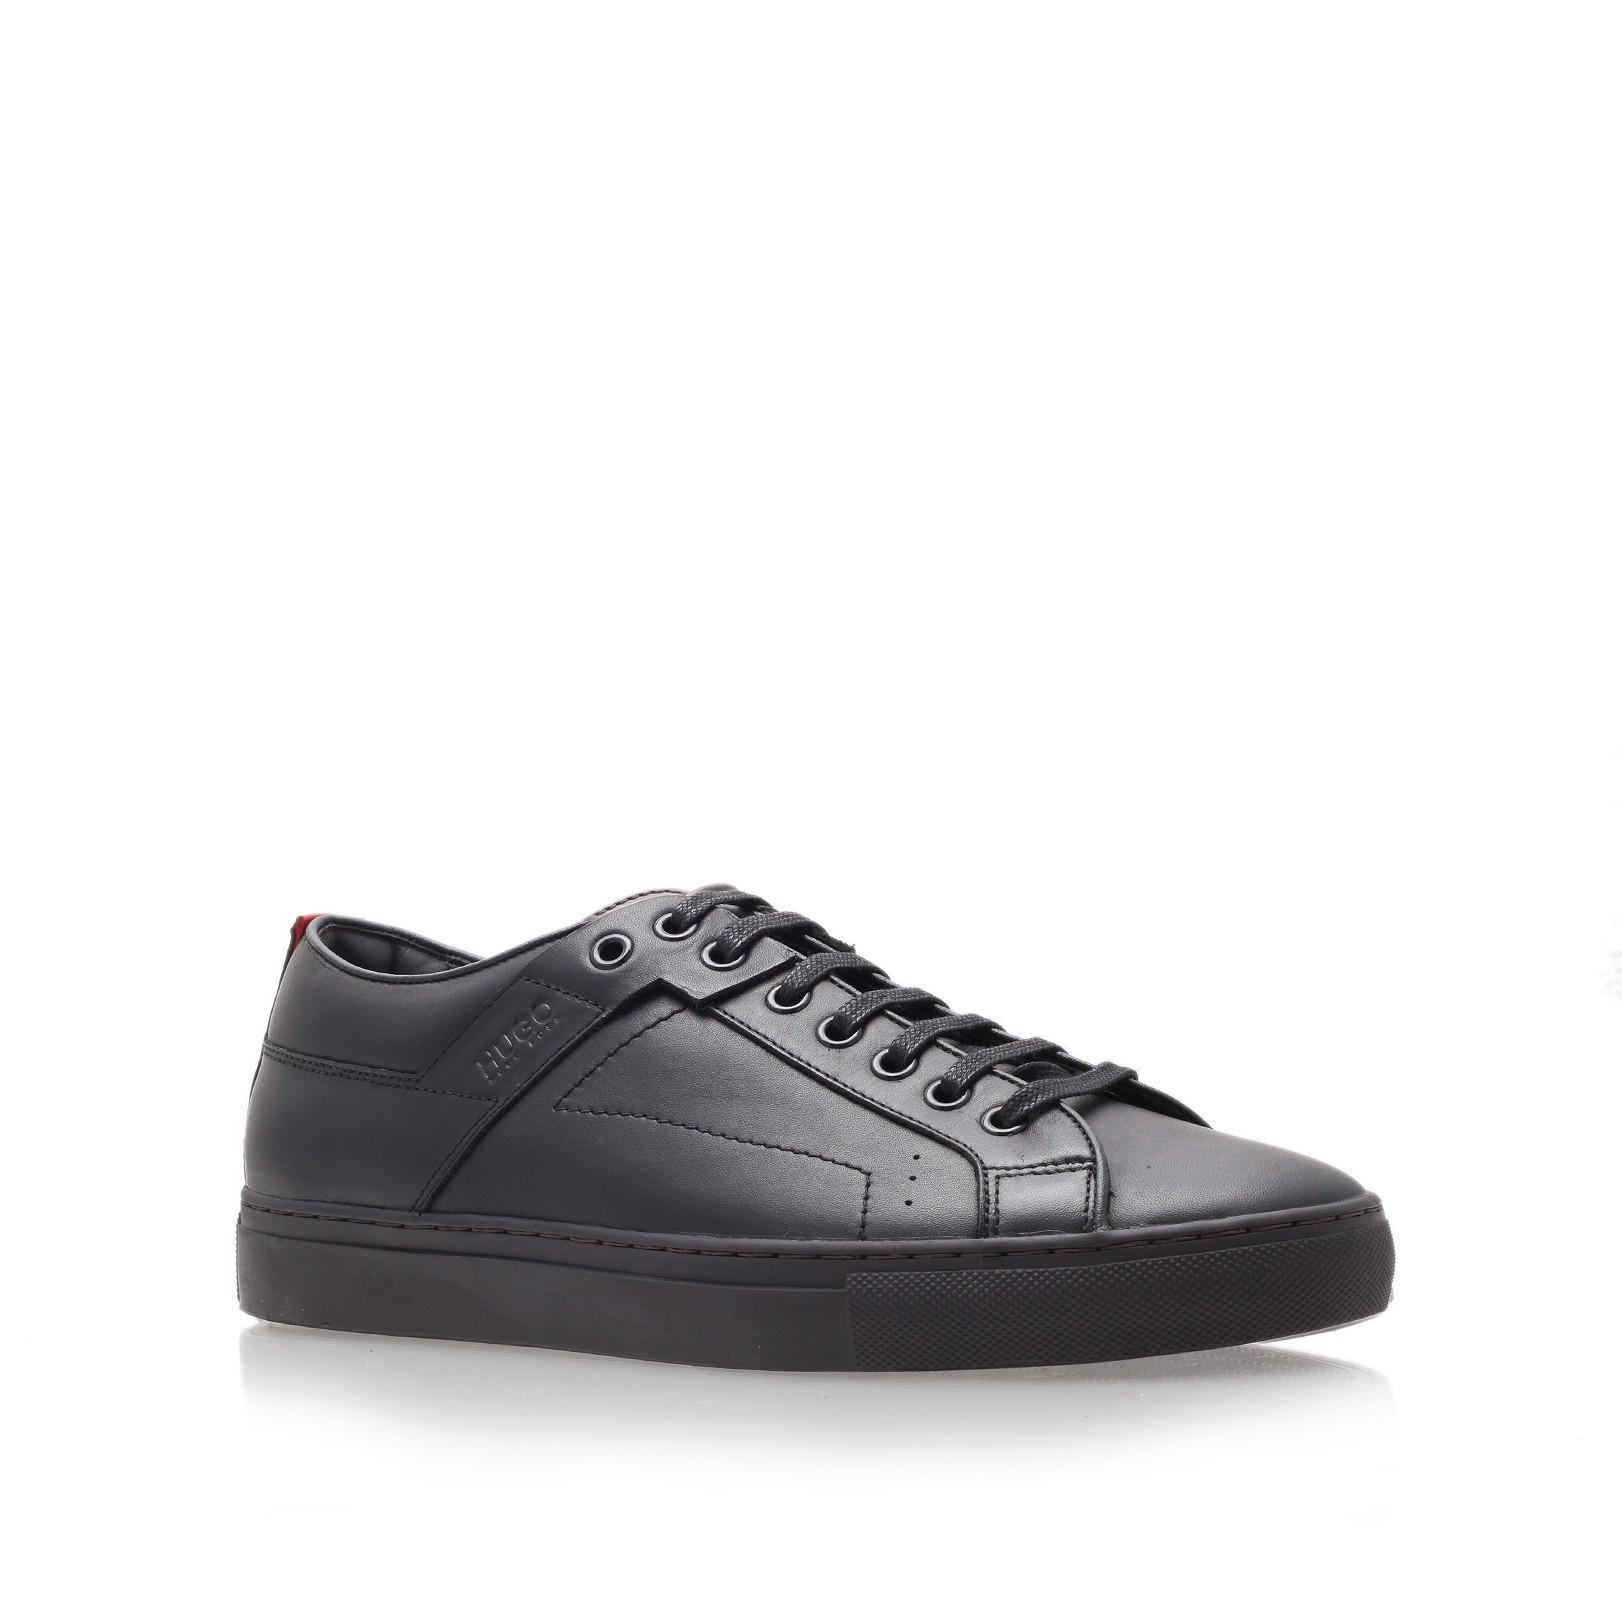 hugo boss futesio tennis sneaker in black for men. Black Bedroom Furniture Sets. Home Design Ideas